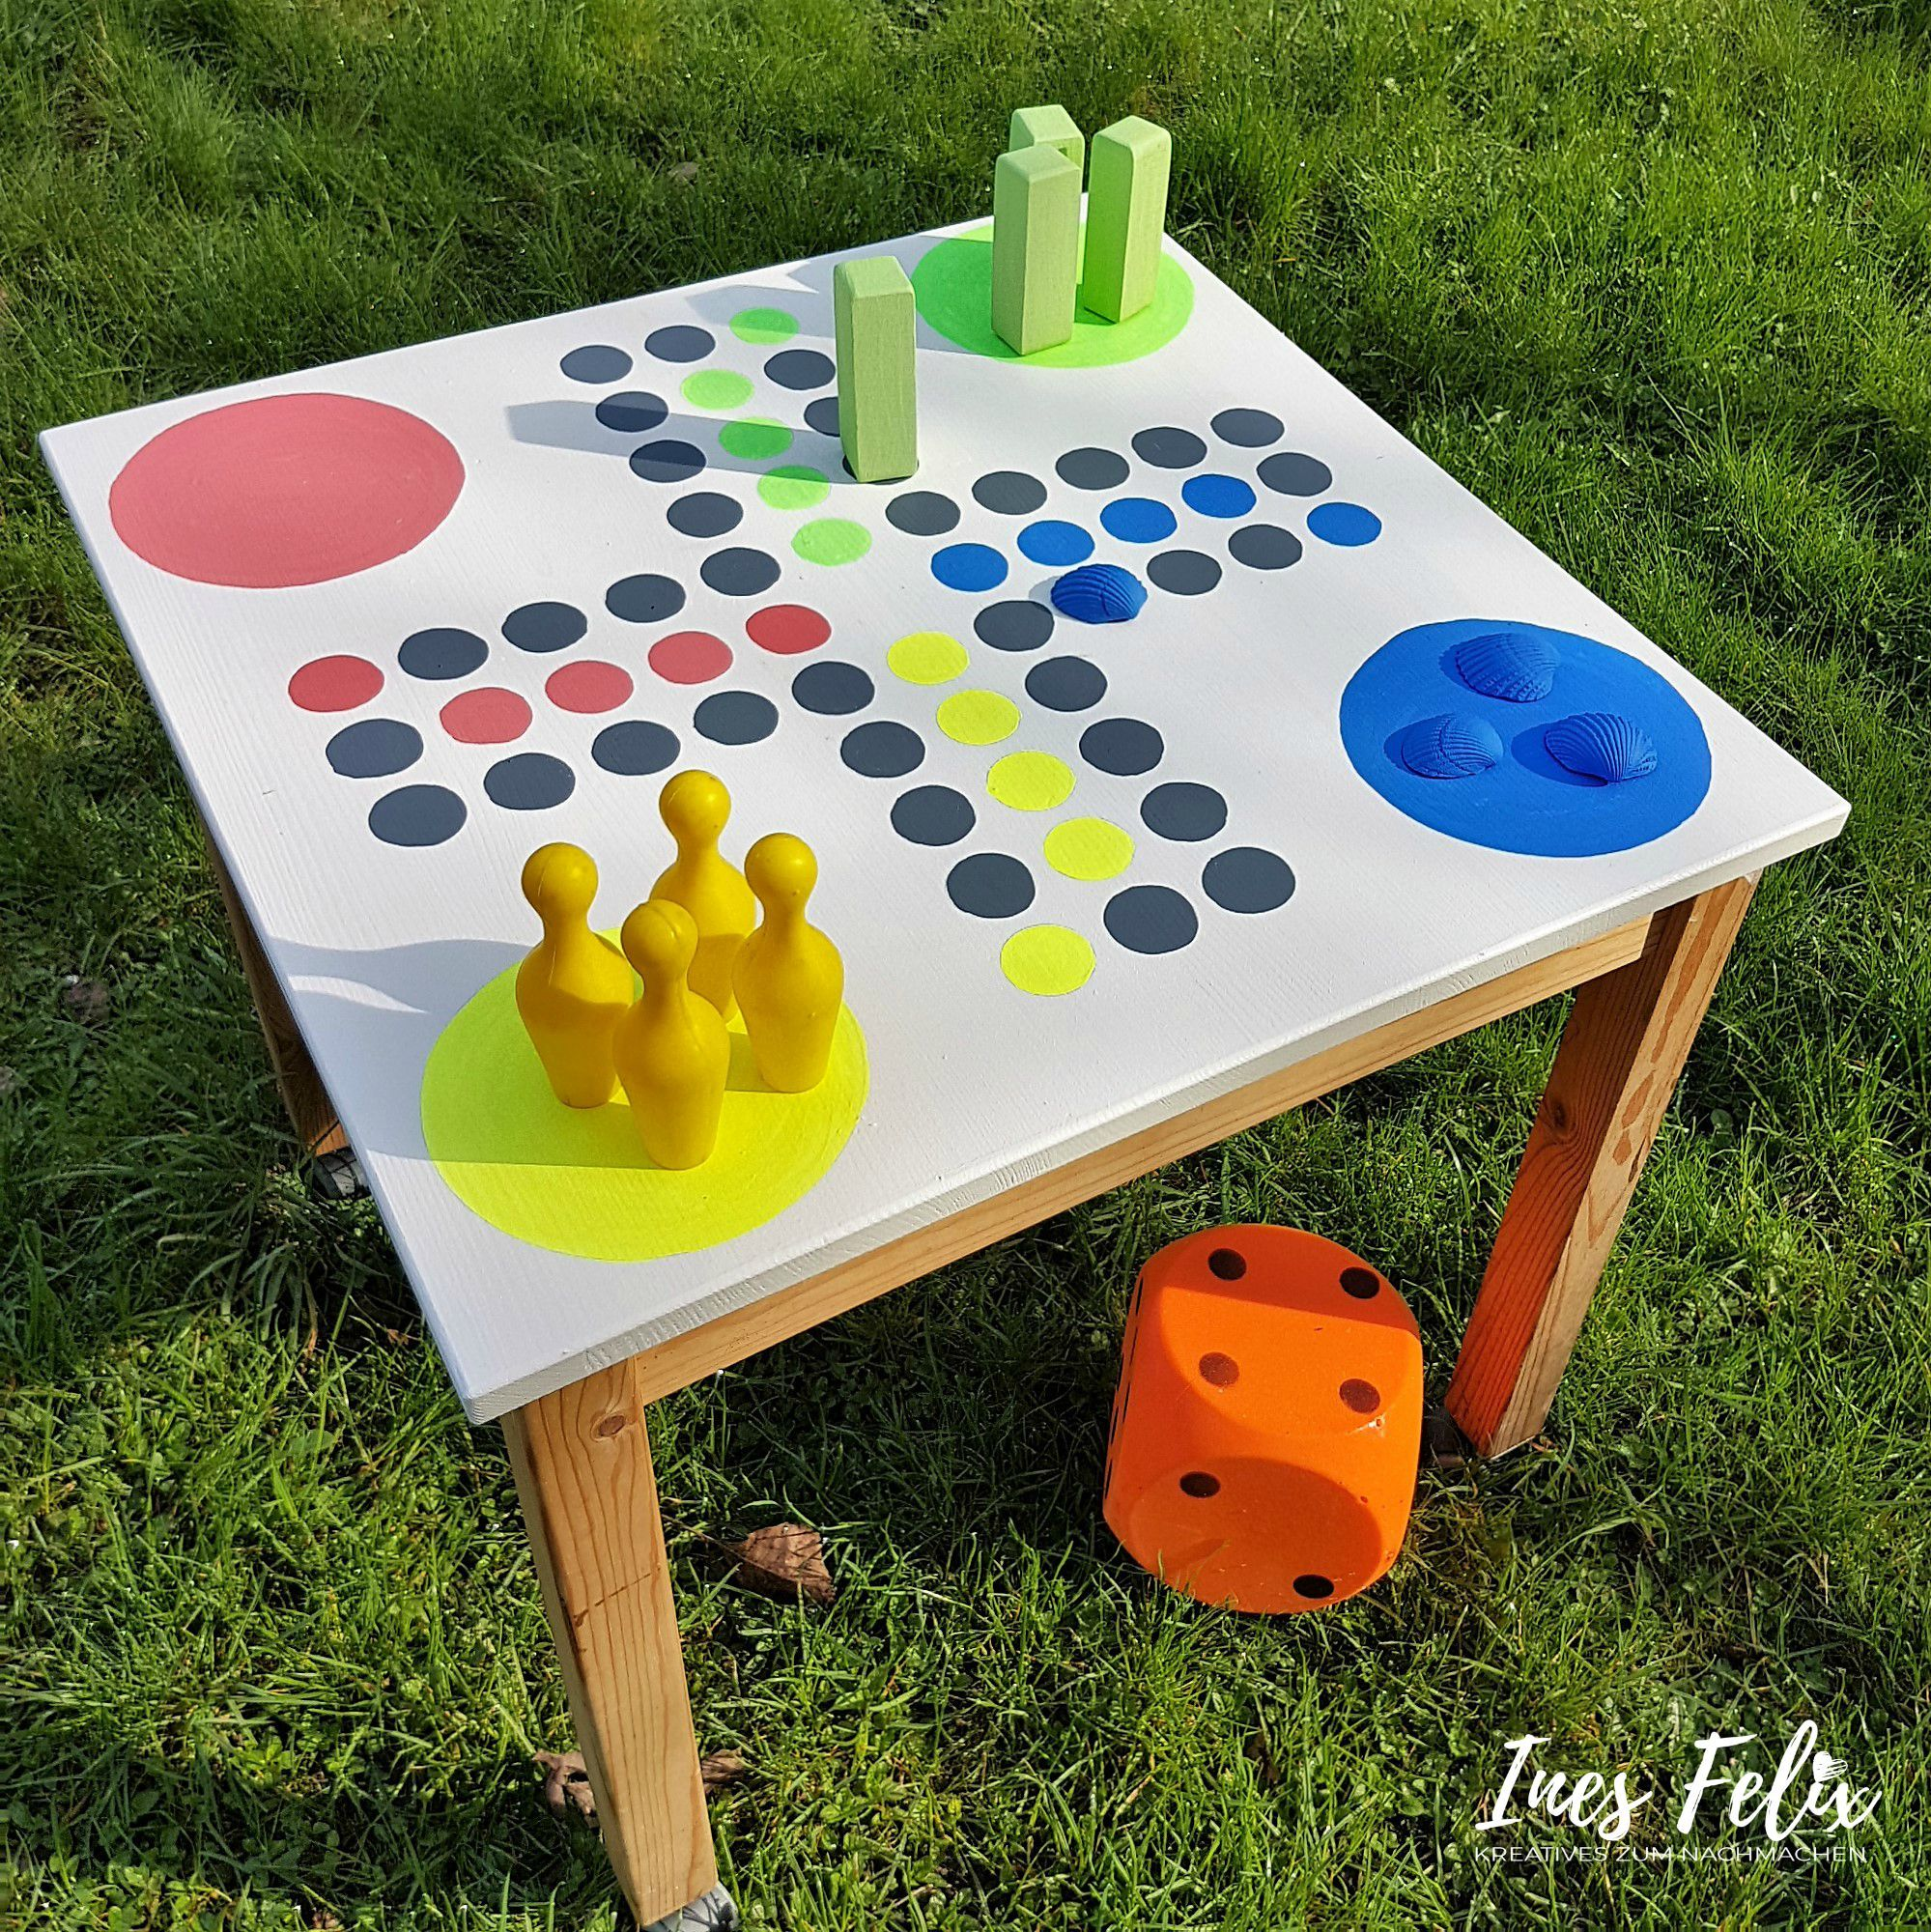 Mensch Ärgere Dich Nicht Gartentisch Spieltisch Für Den Garten Selbst Gemacht Spieltisch Gartentisch Kinder Gartentisch